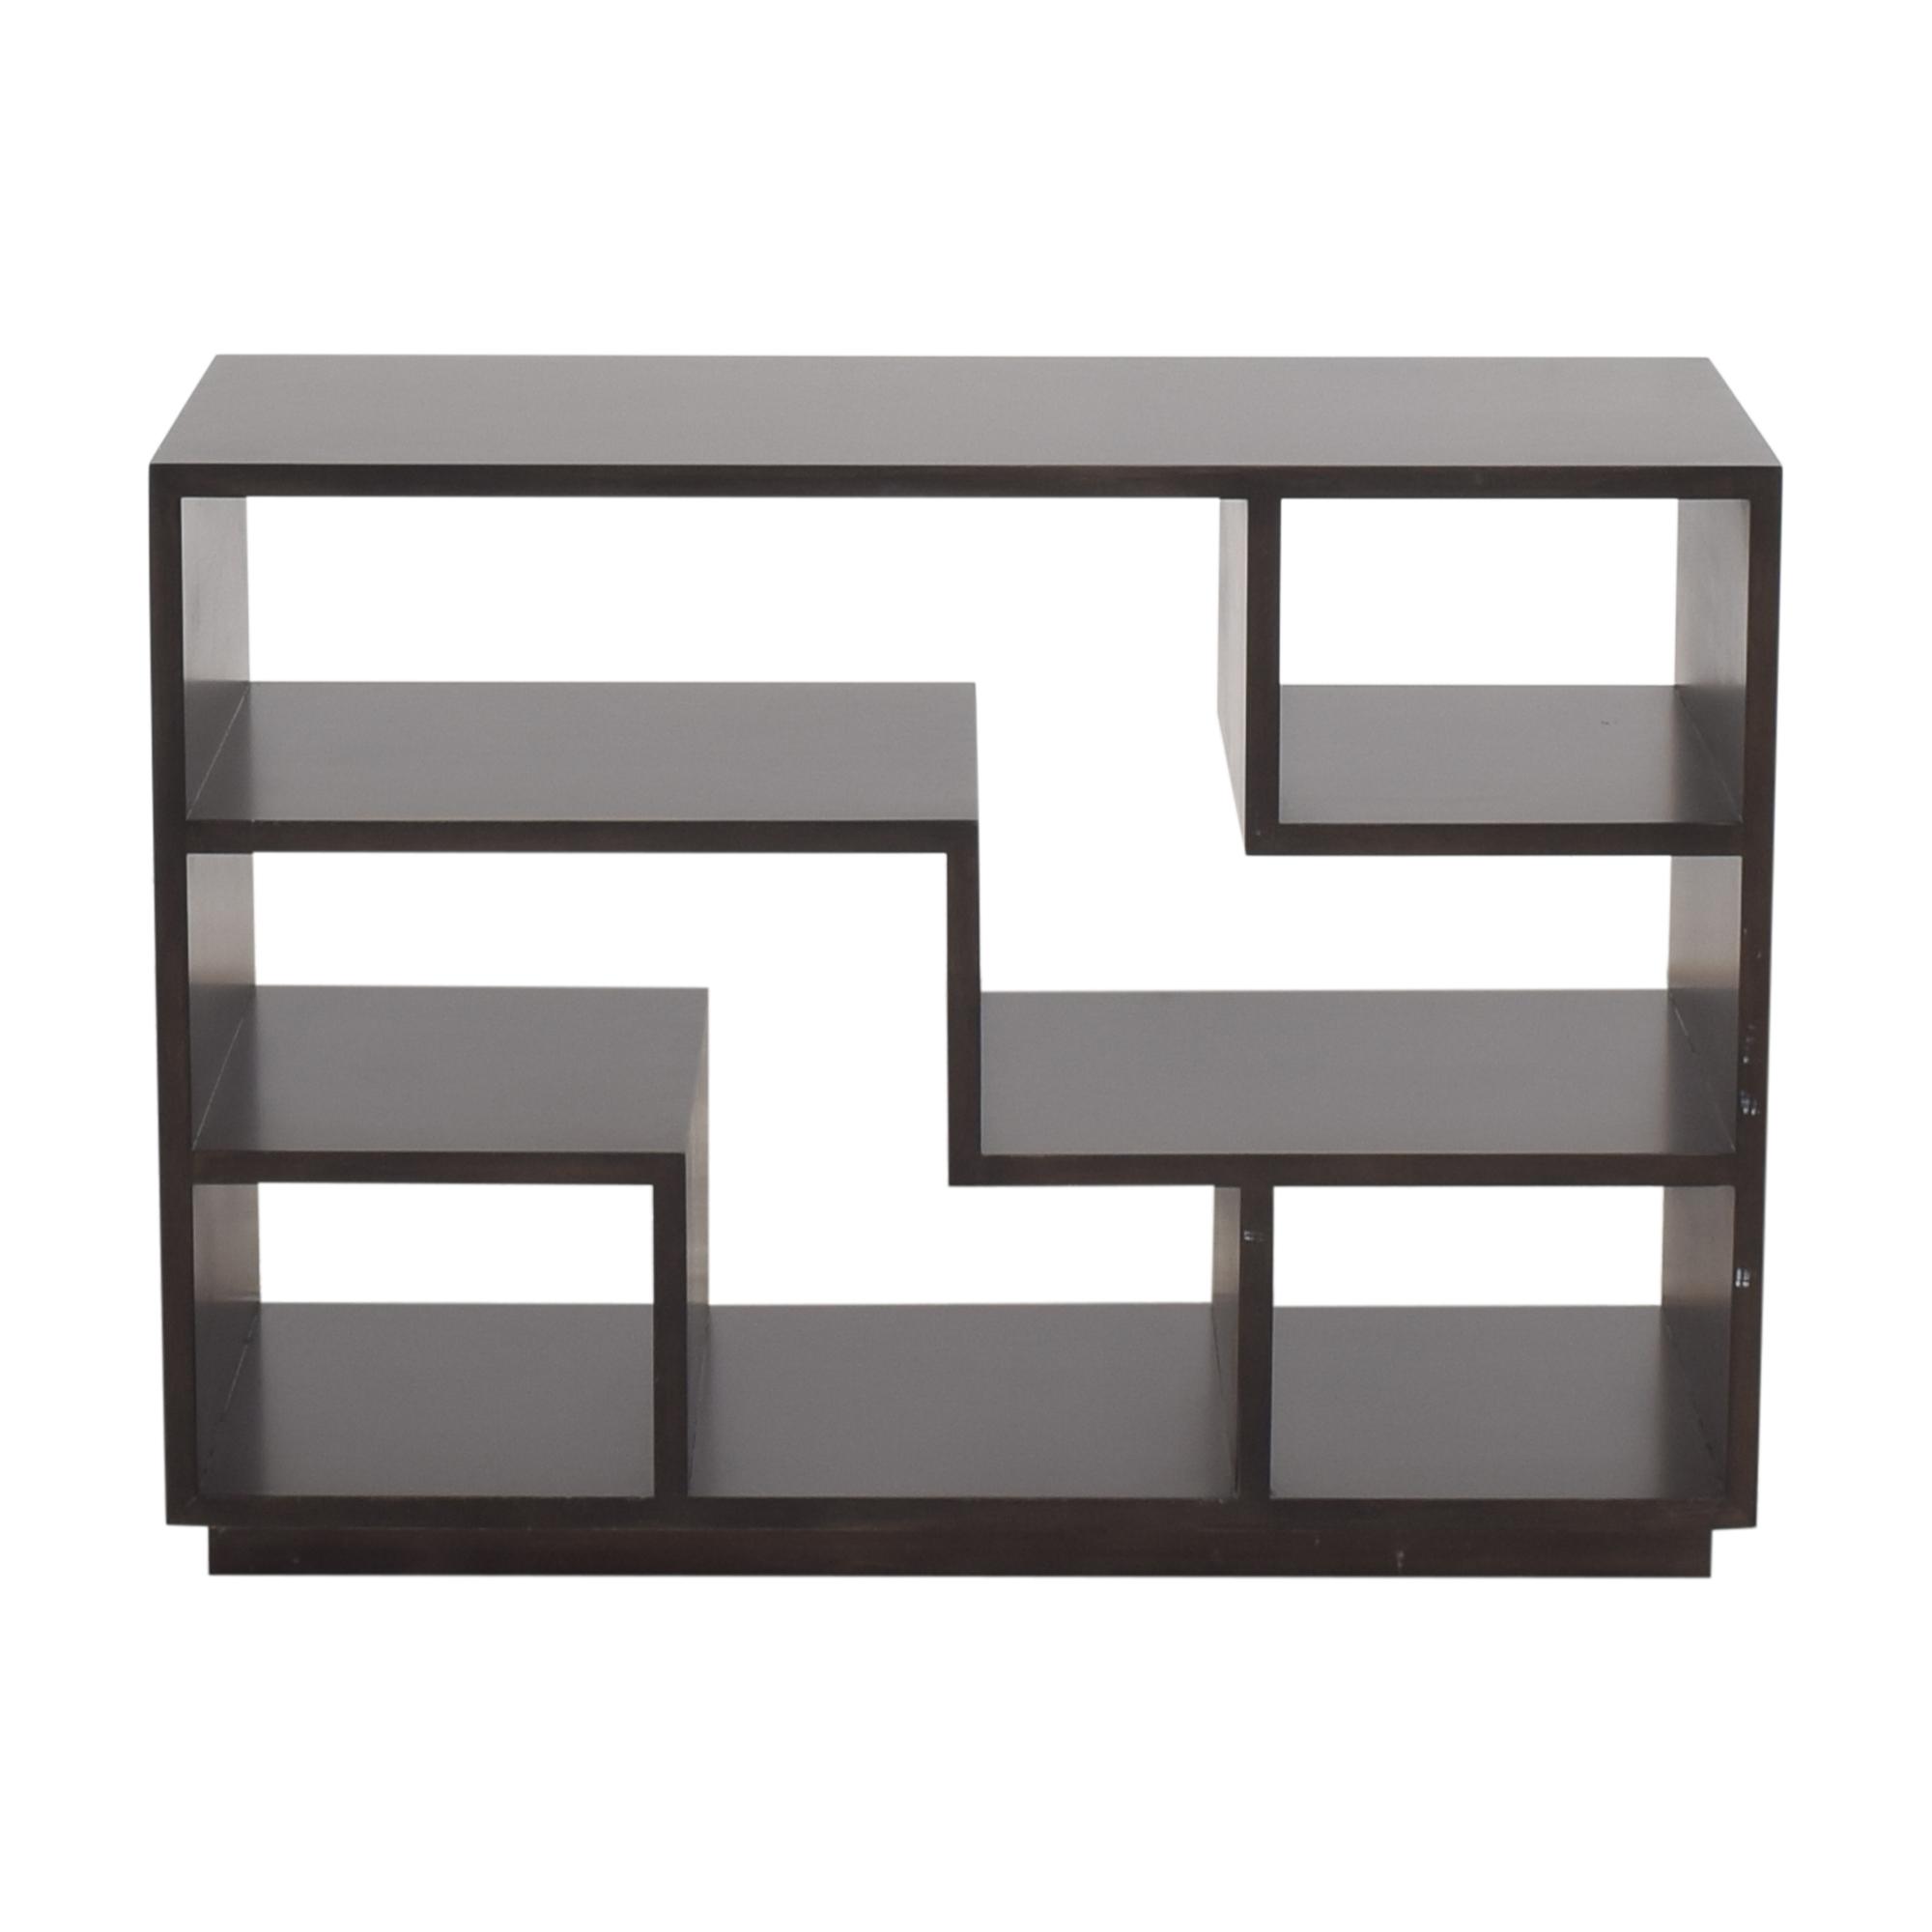 buy Room & Board Network Shelves Room & Board Storage